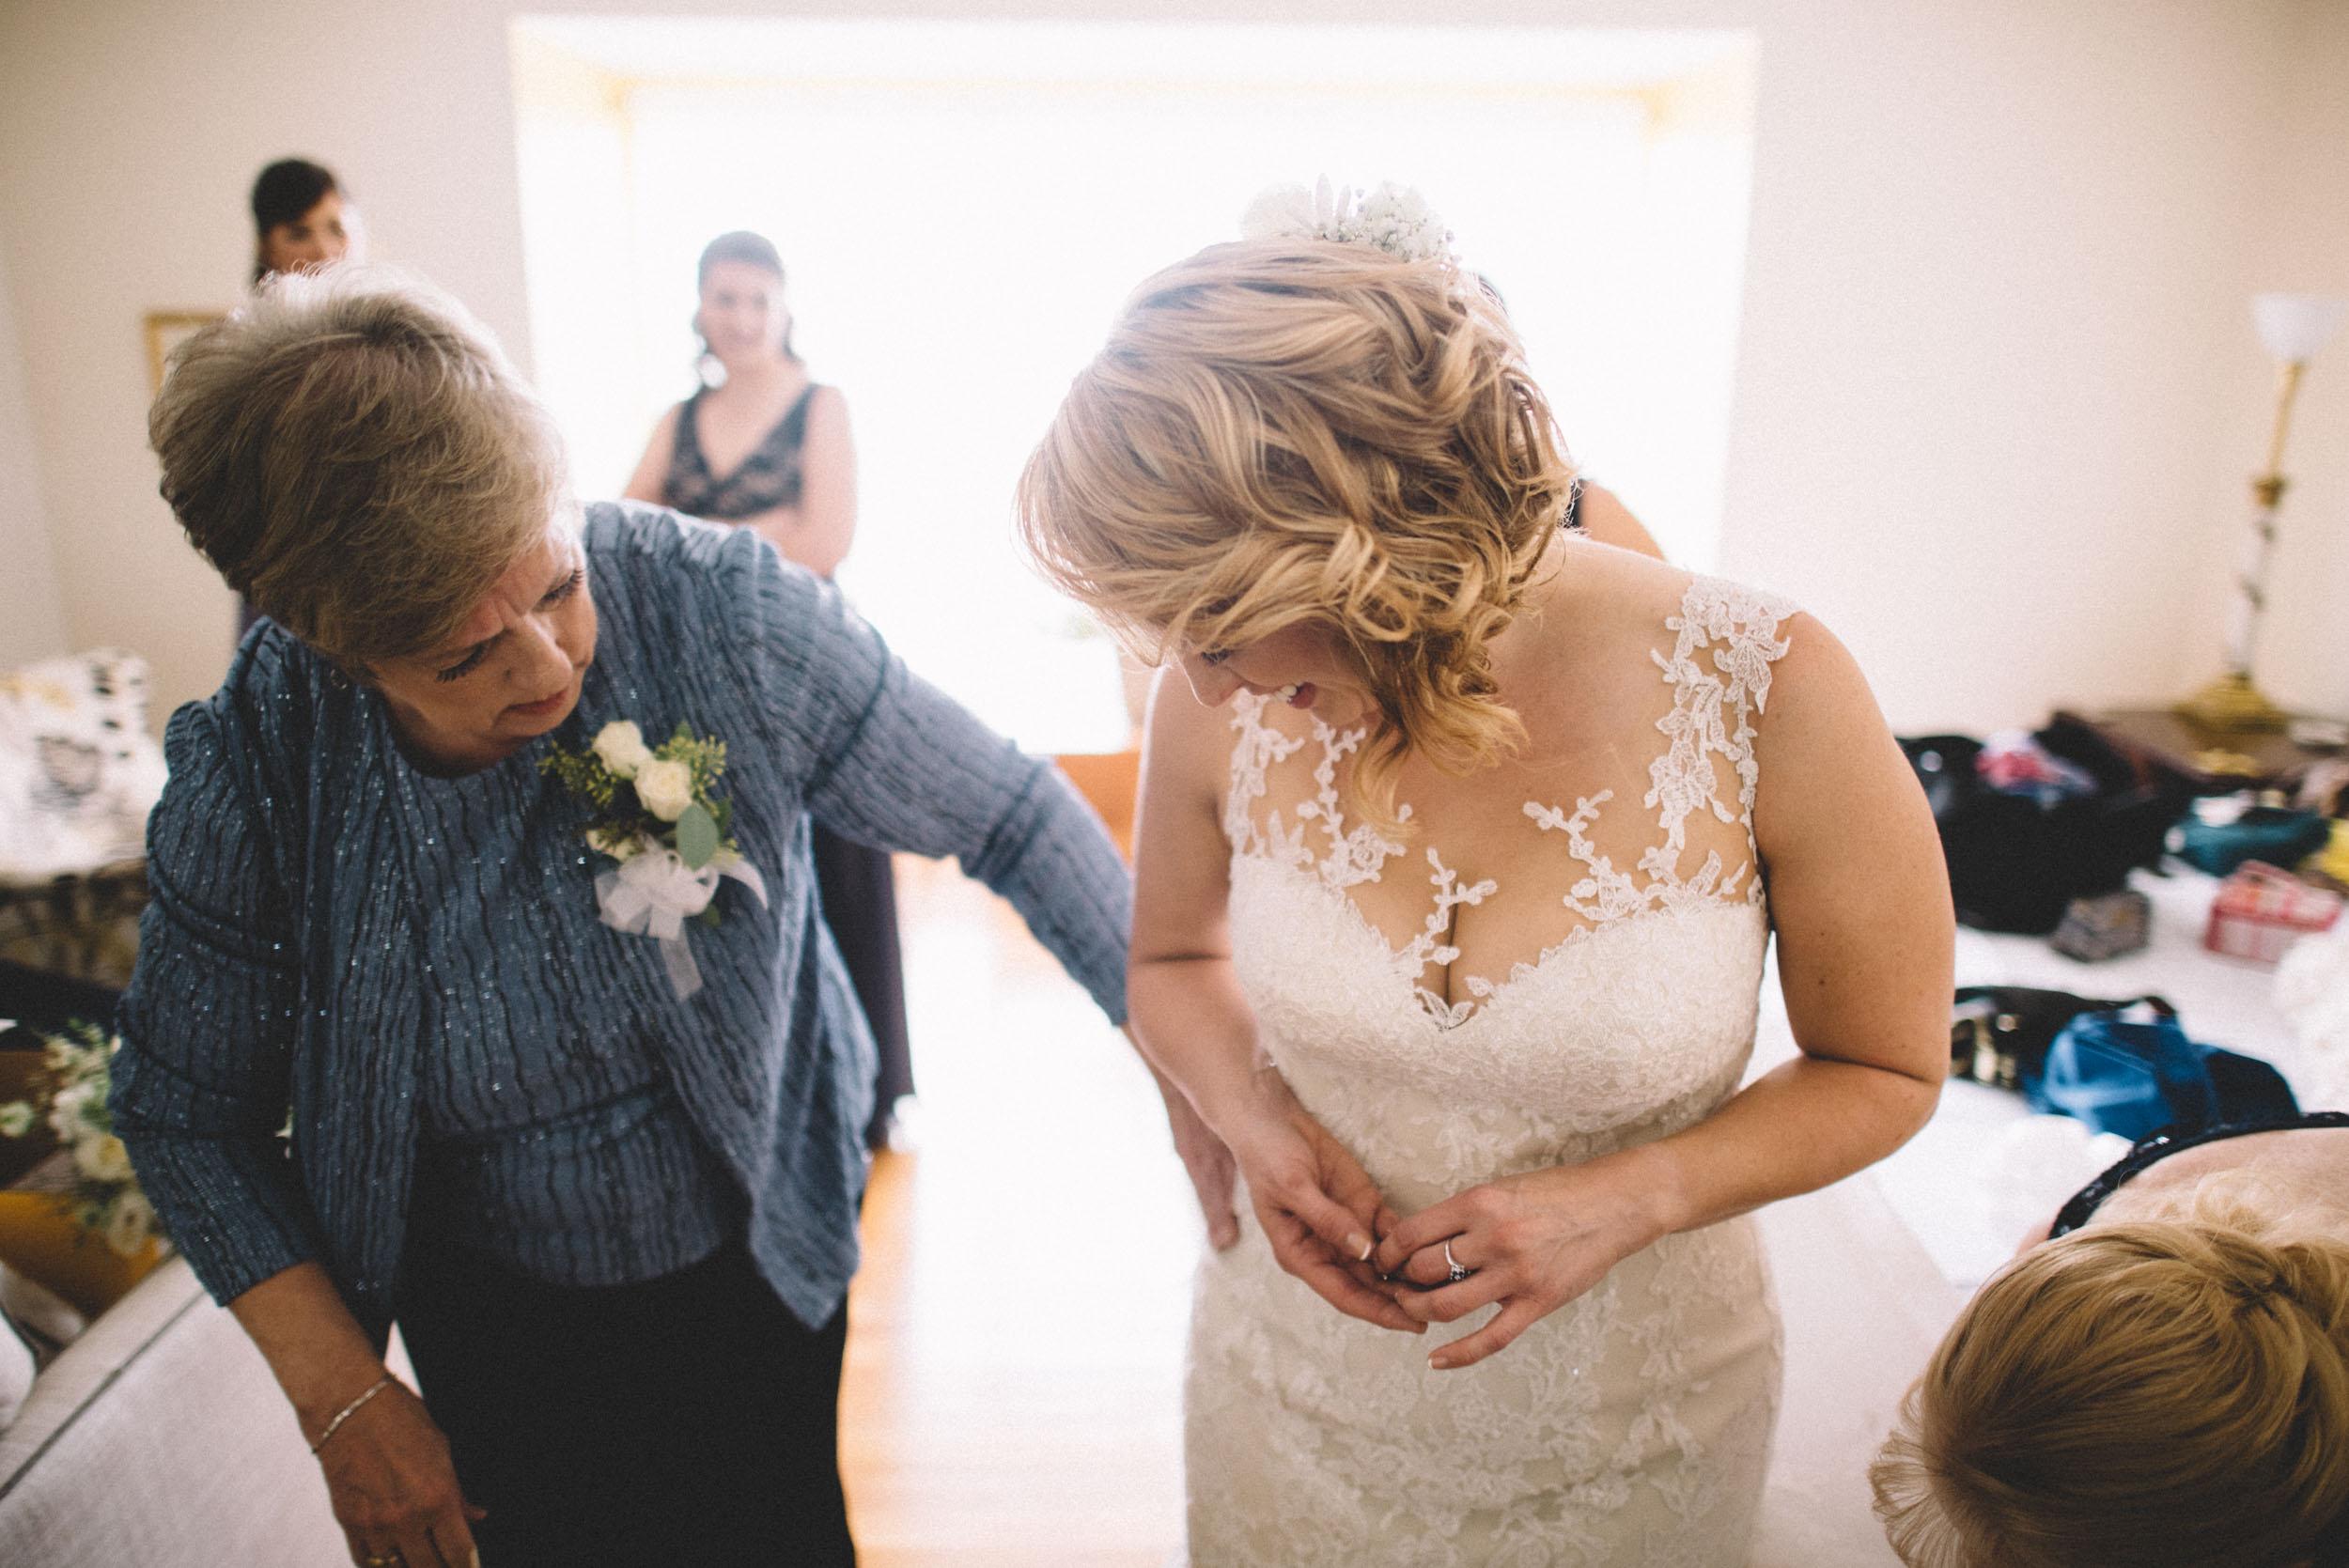 Gaie-Lea-Staunton-weddding-photographer-31.jpg